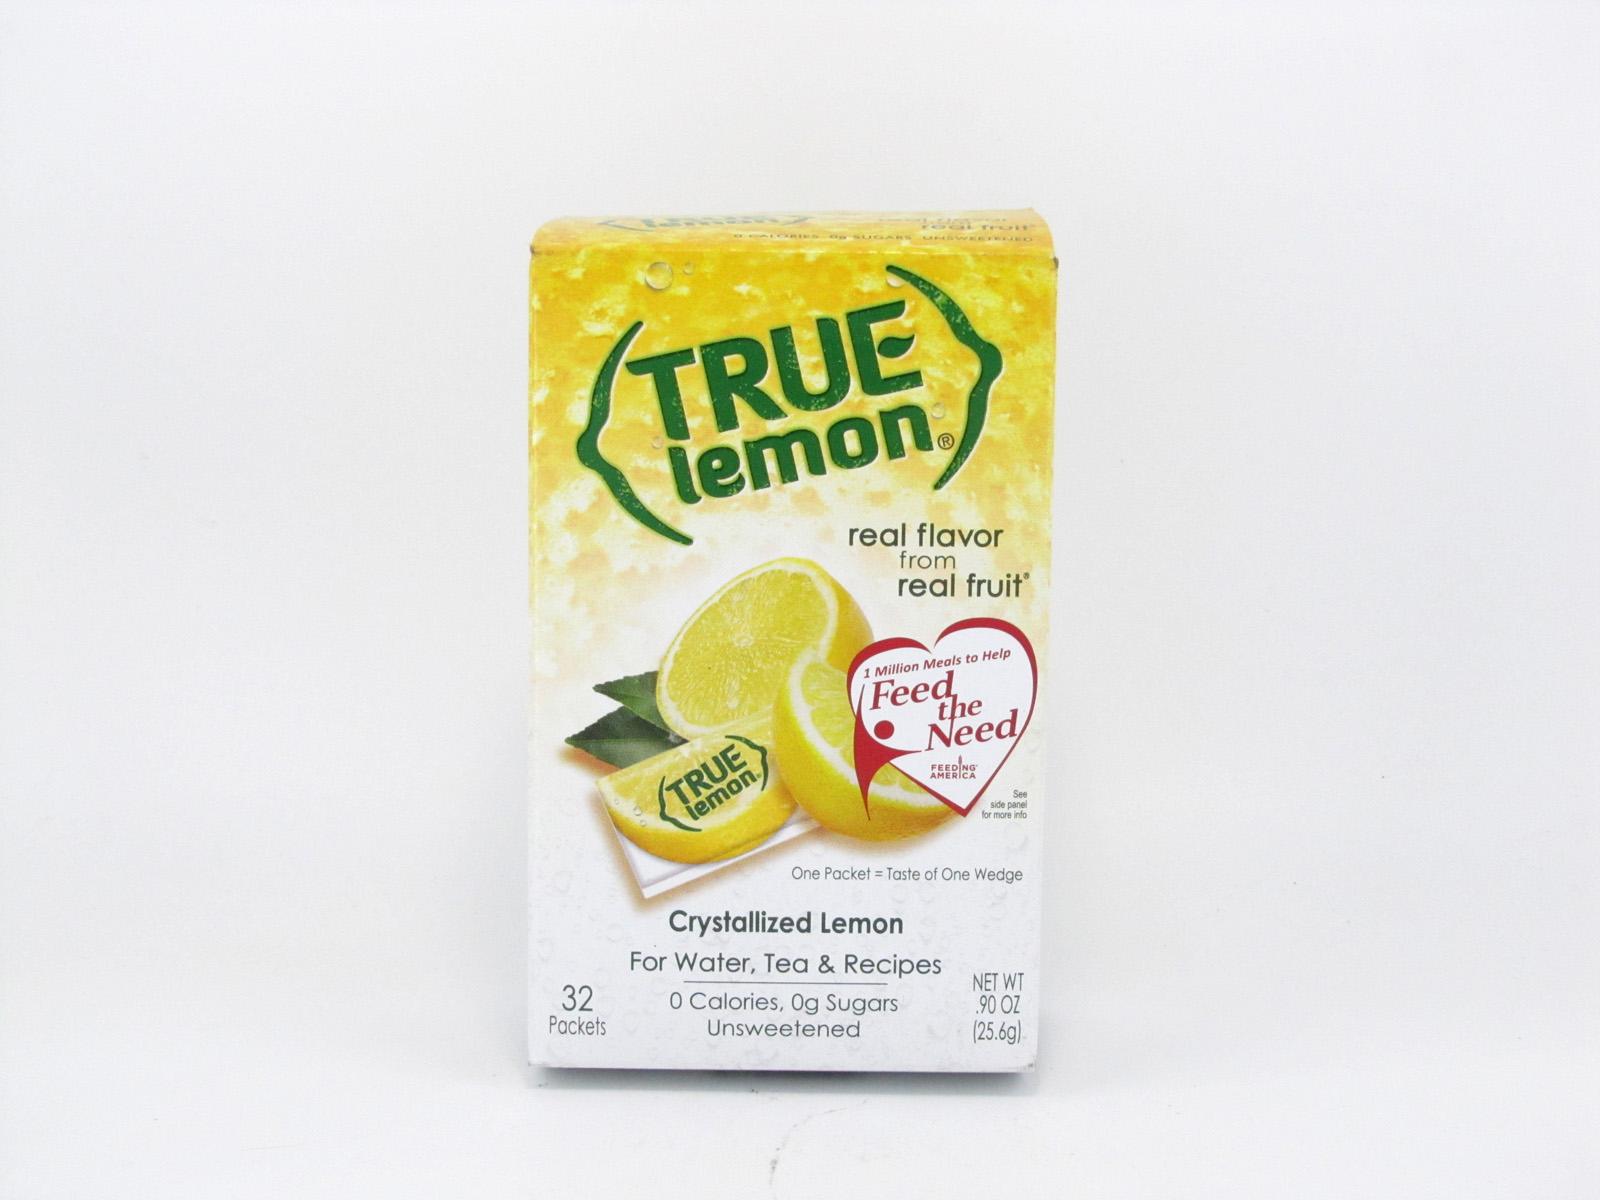 True - Lemon Powder - front view